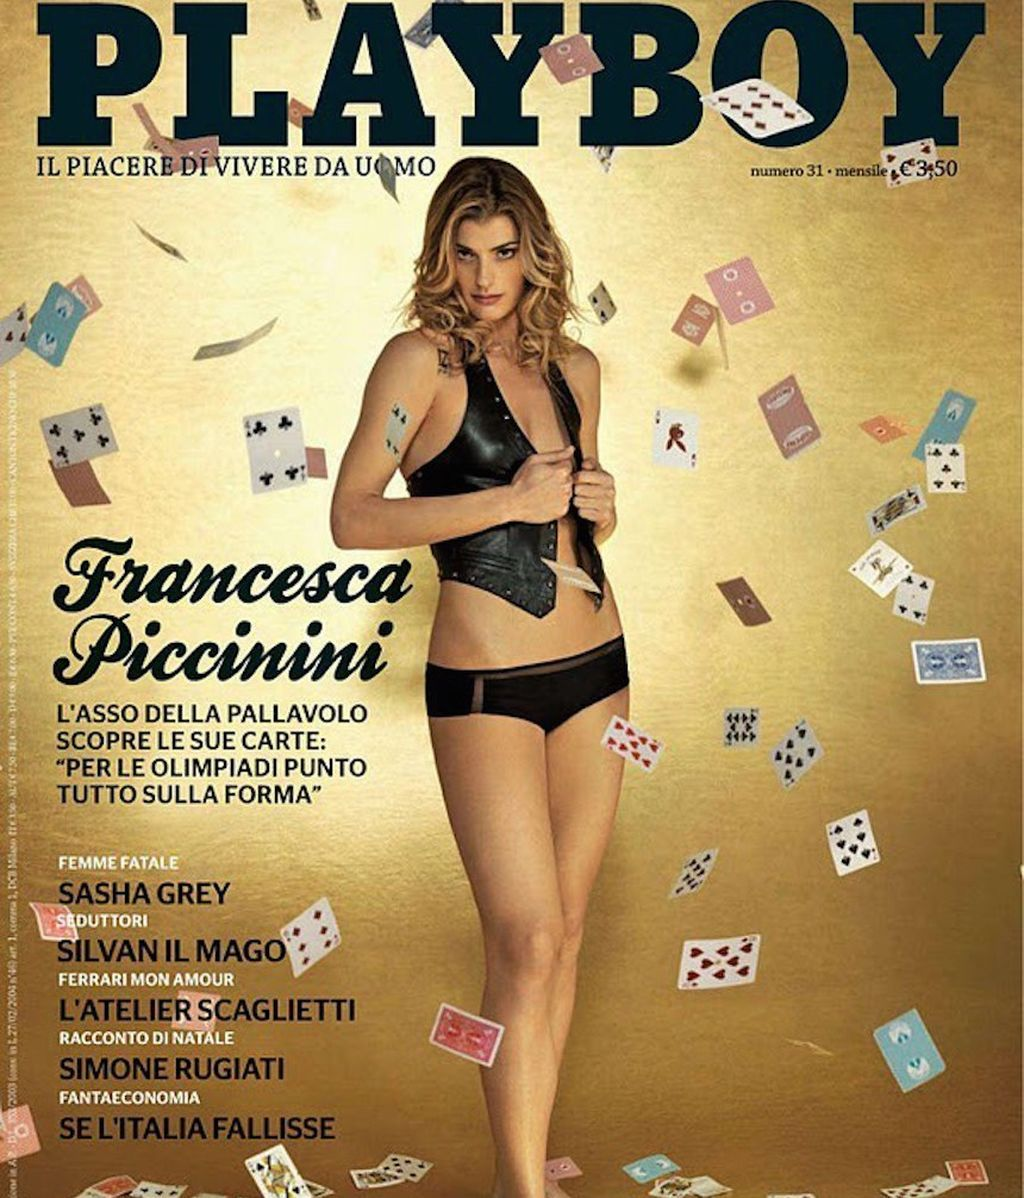 Francesca Piccinini, jugadora de voleibol italiana